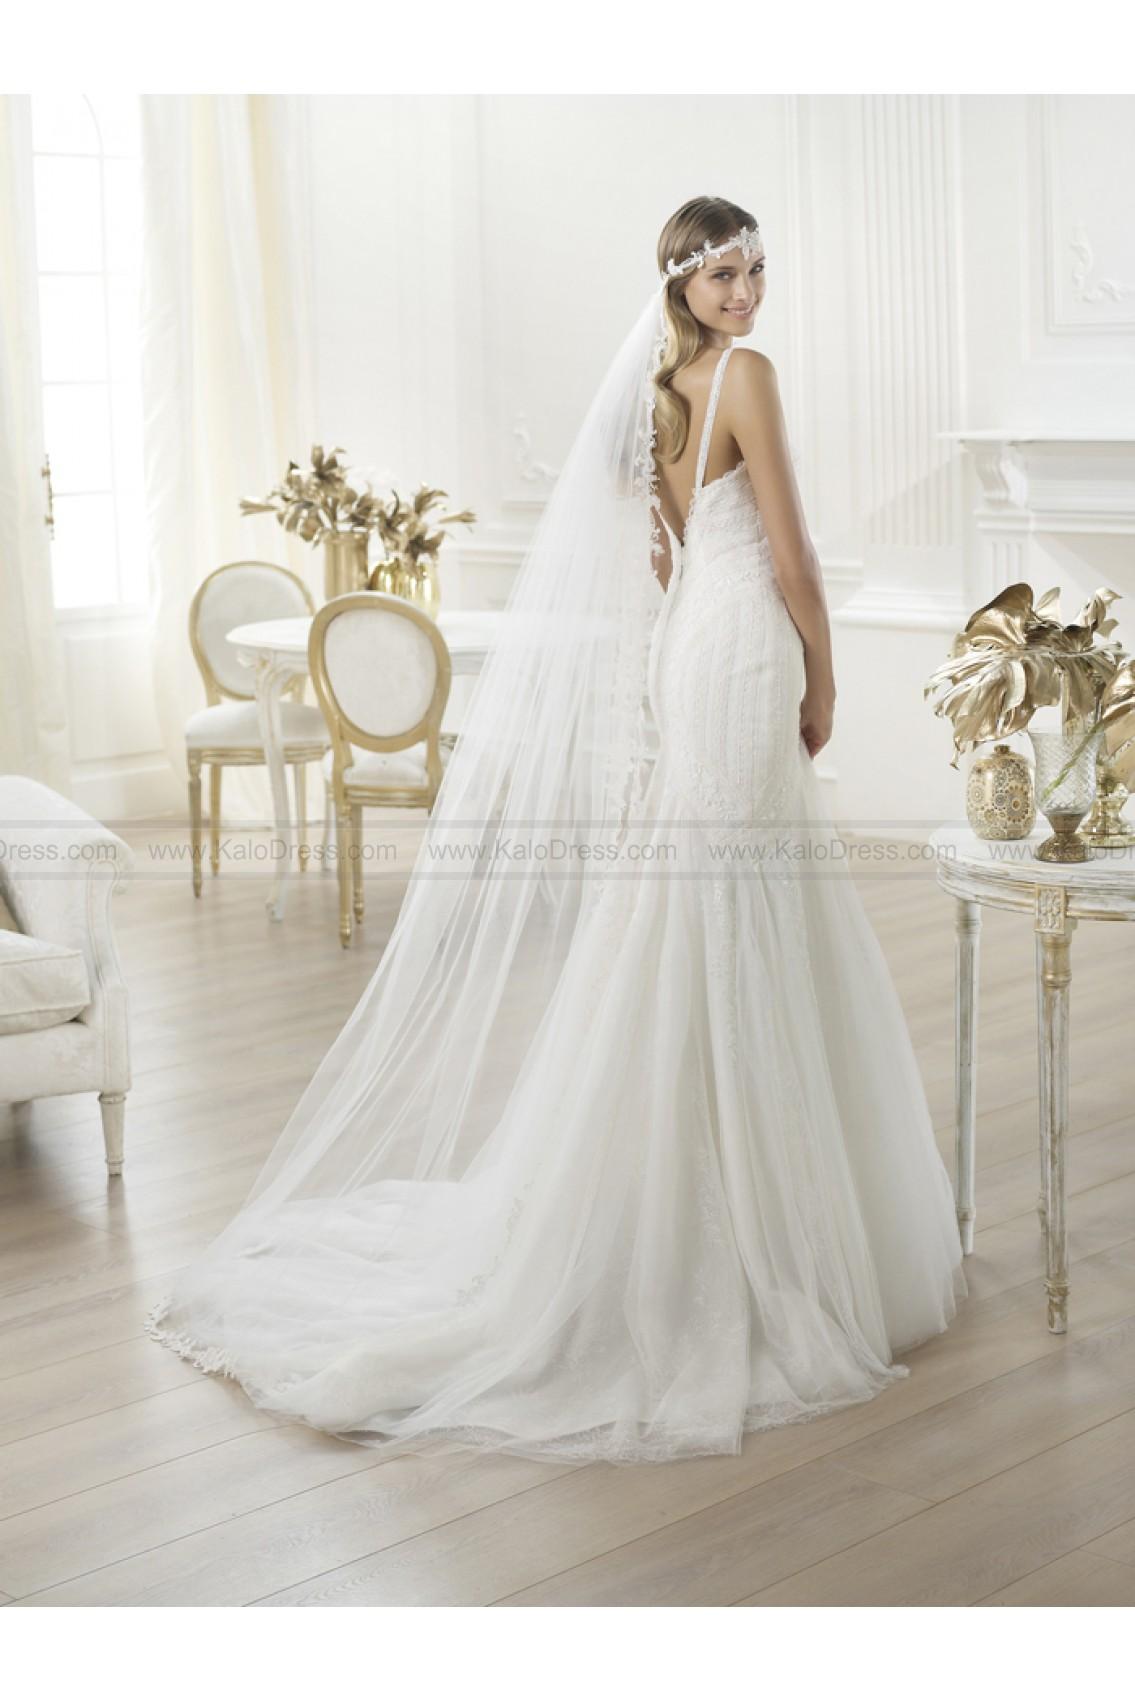 Pronovias Wedding Dresses - Style Lary - Wedding Dresses 2014 New - Formal Wedding Dresses